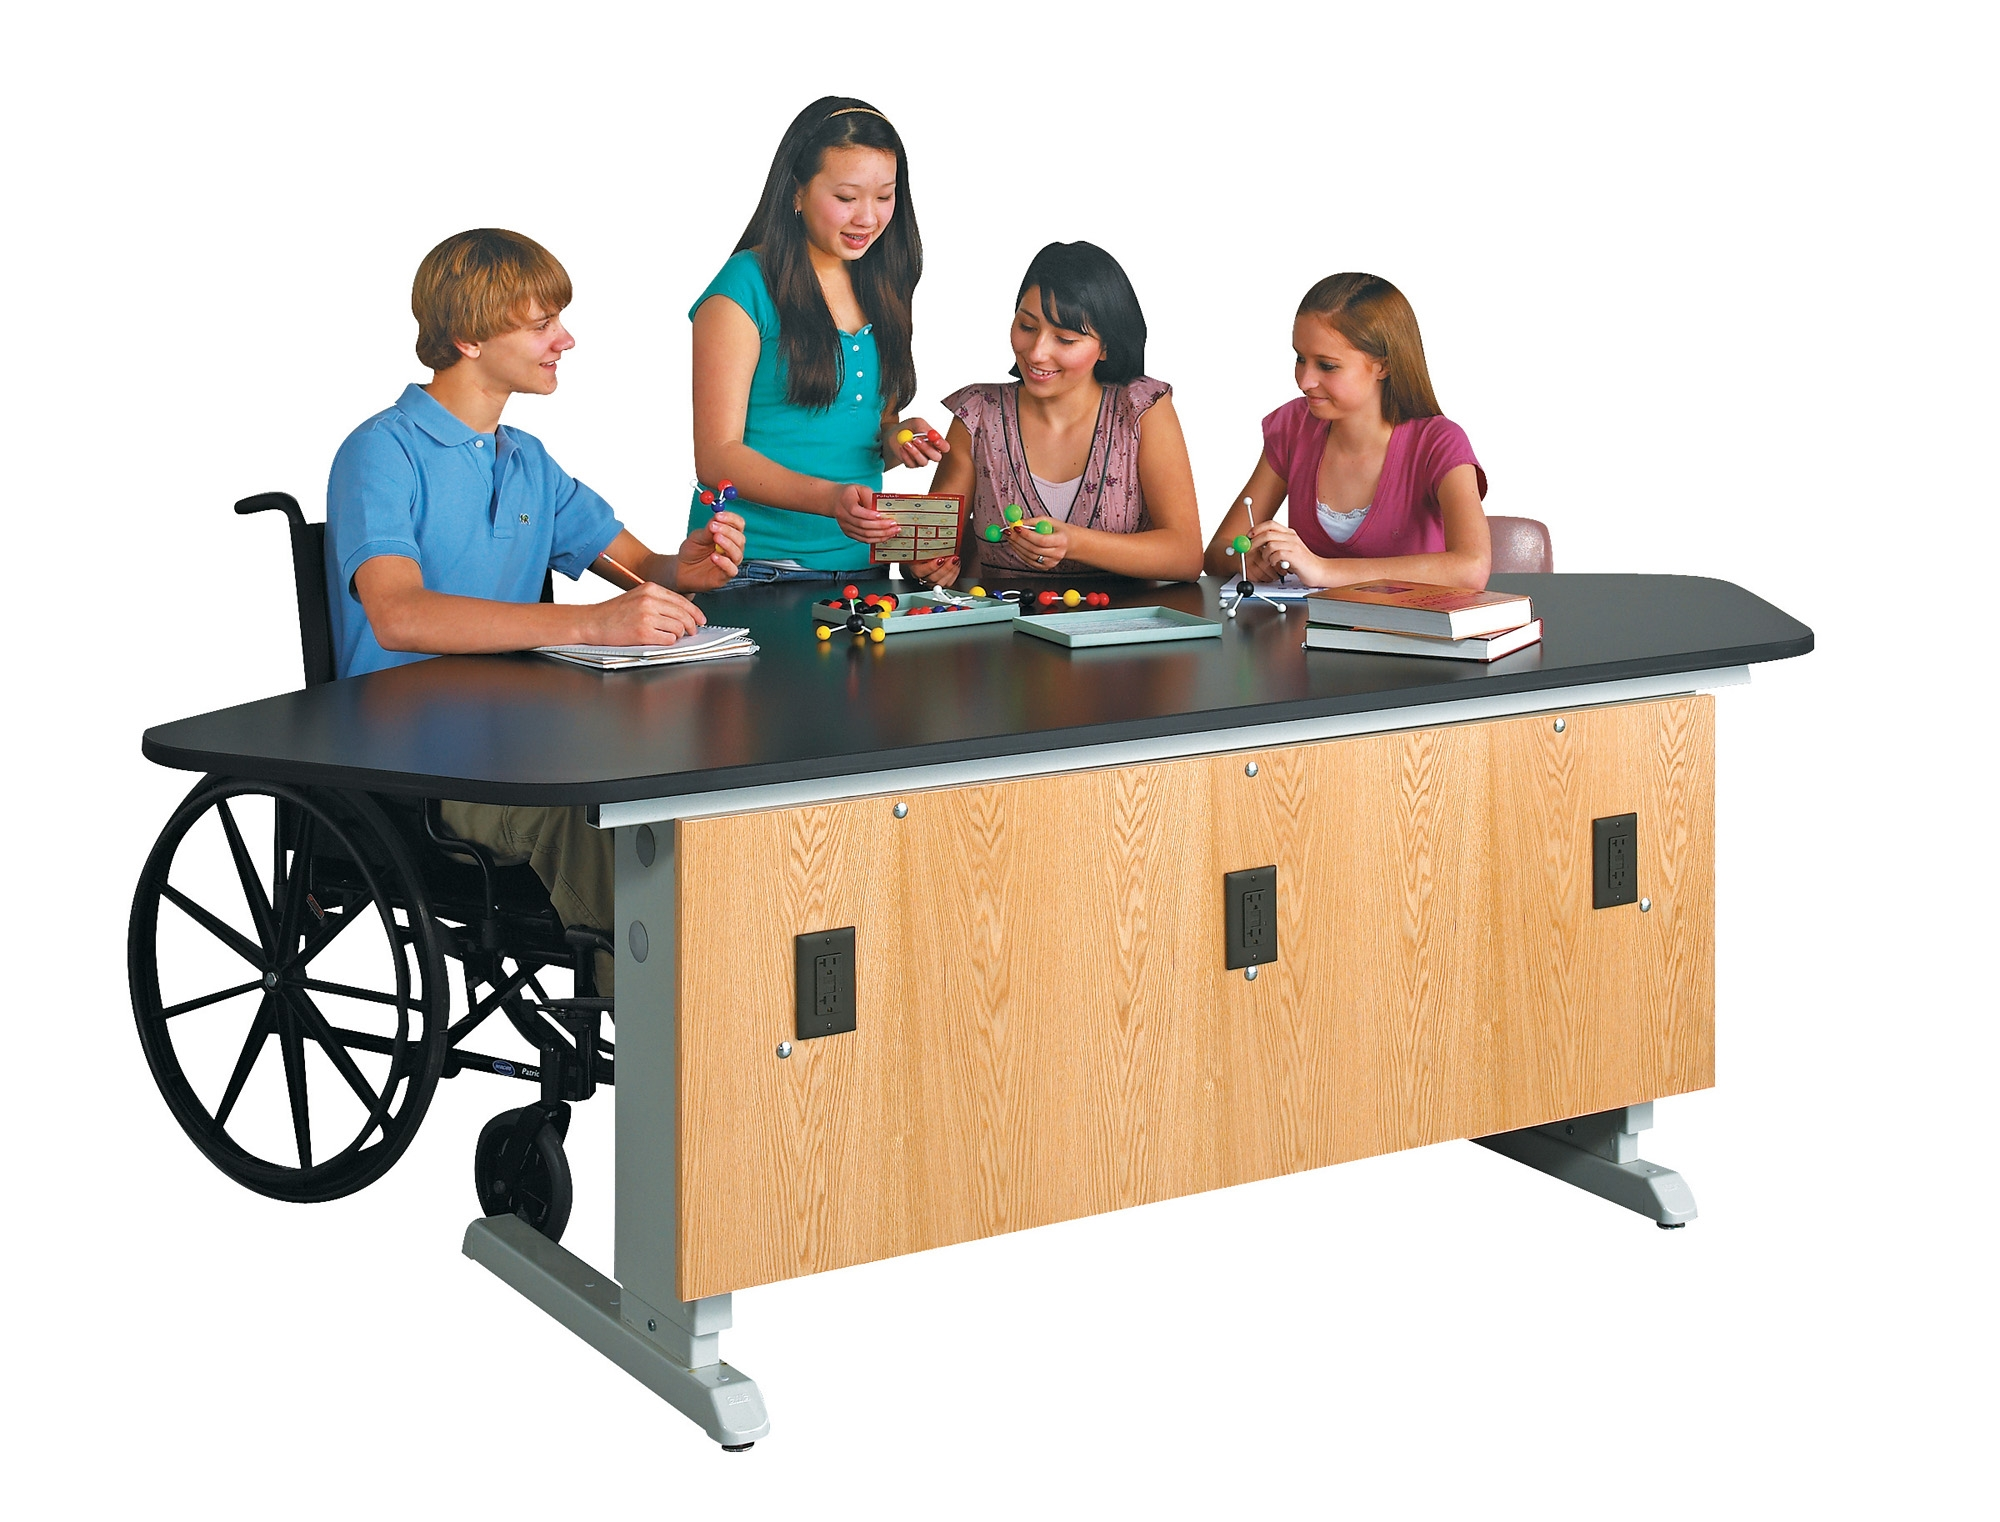 Diversified Woodcrafts EZ-Lift 4 Student Workstation - Epoxy Top